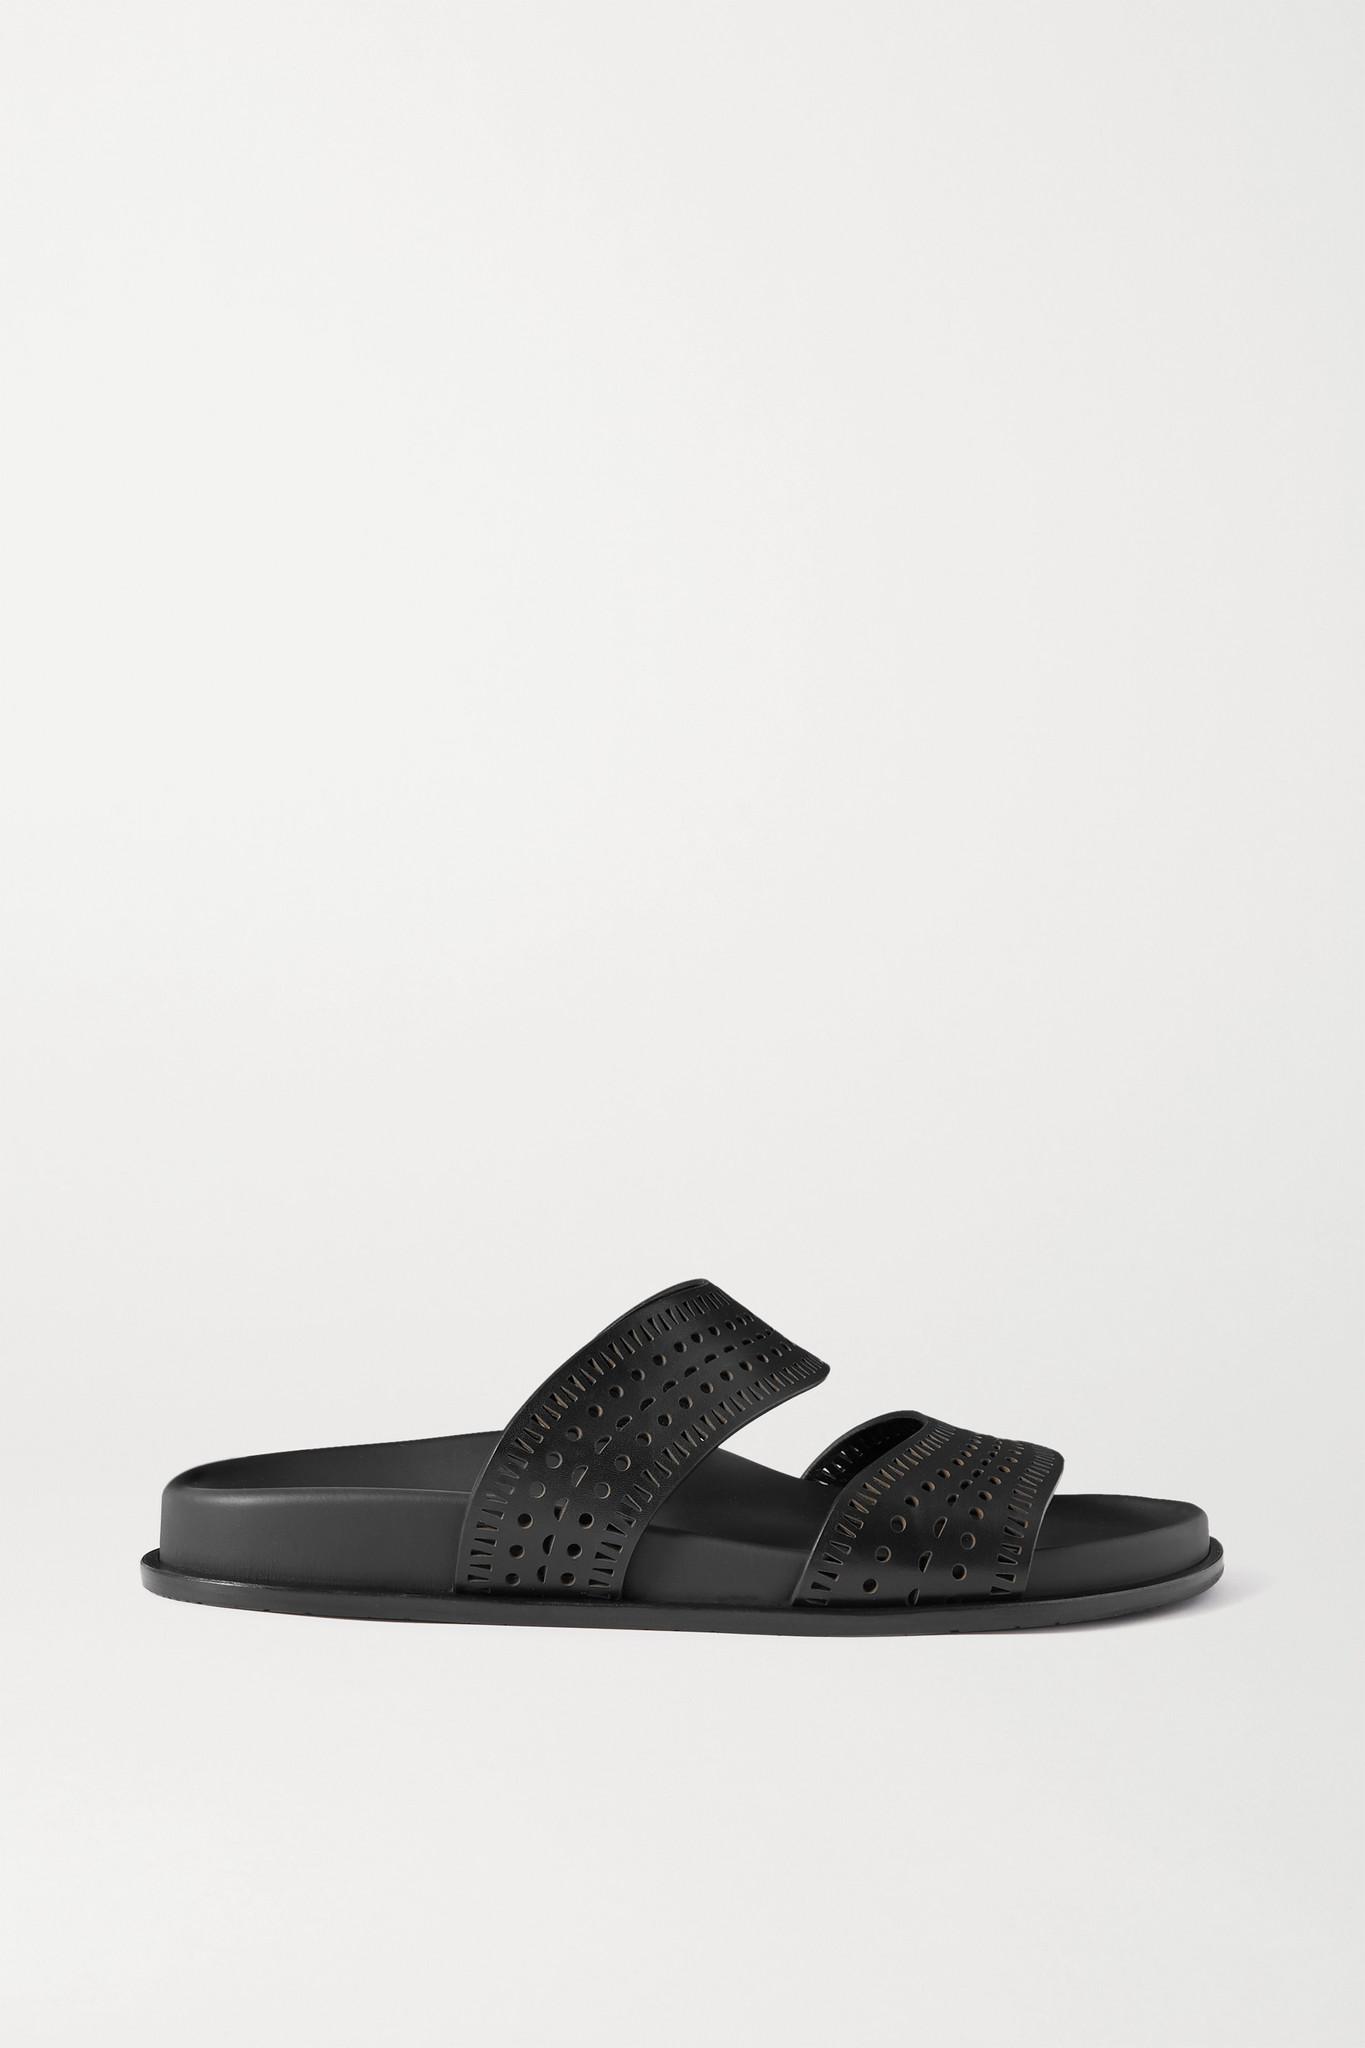 ALAÏA - Laser-cut Leather Slides - Black - IT35